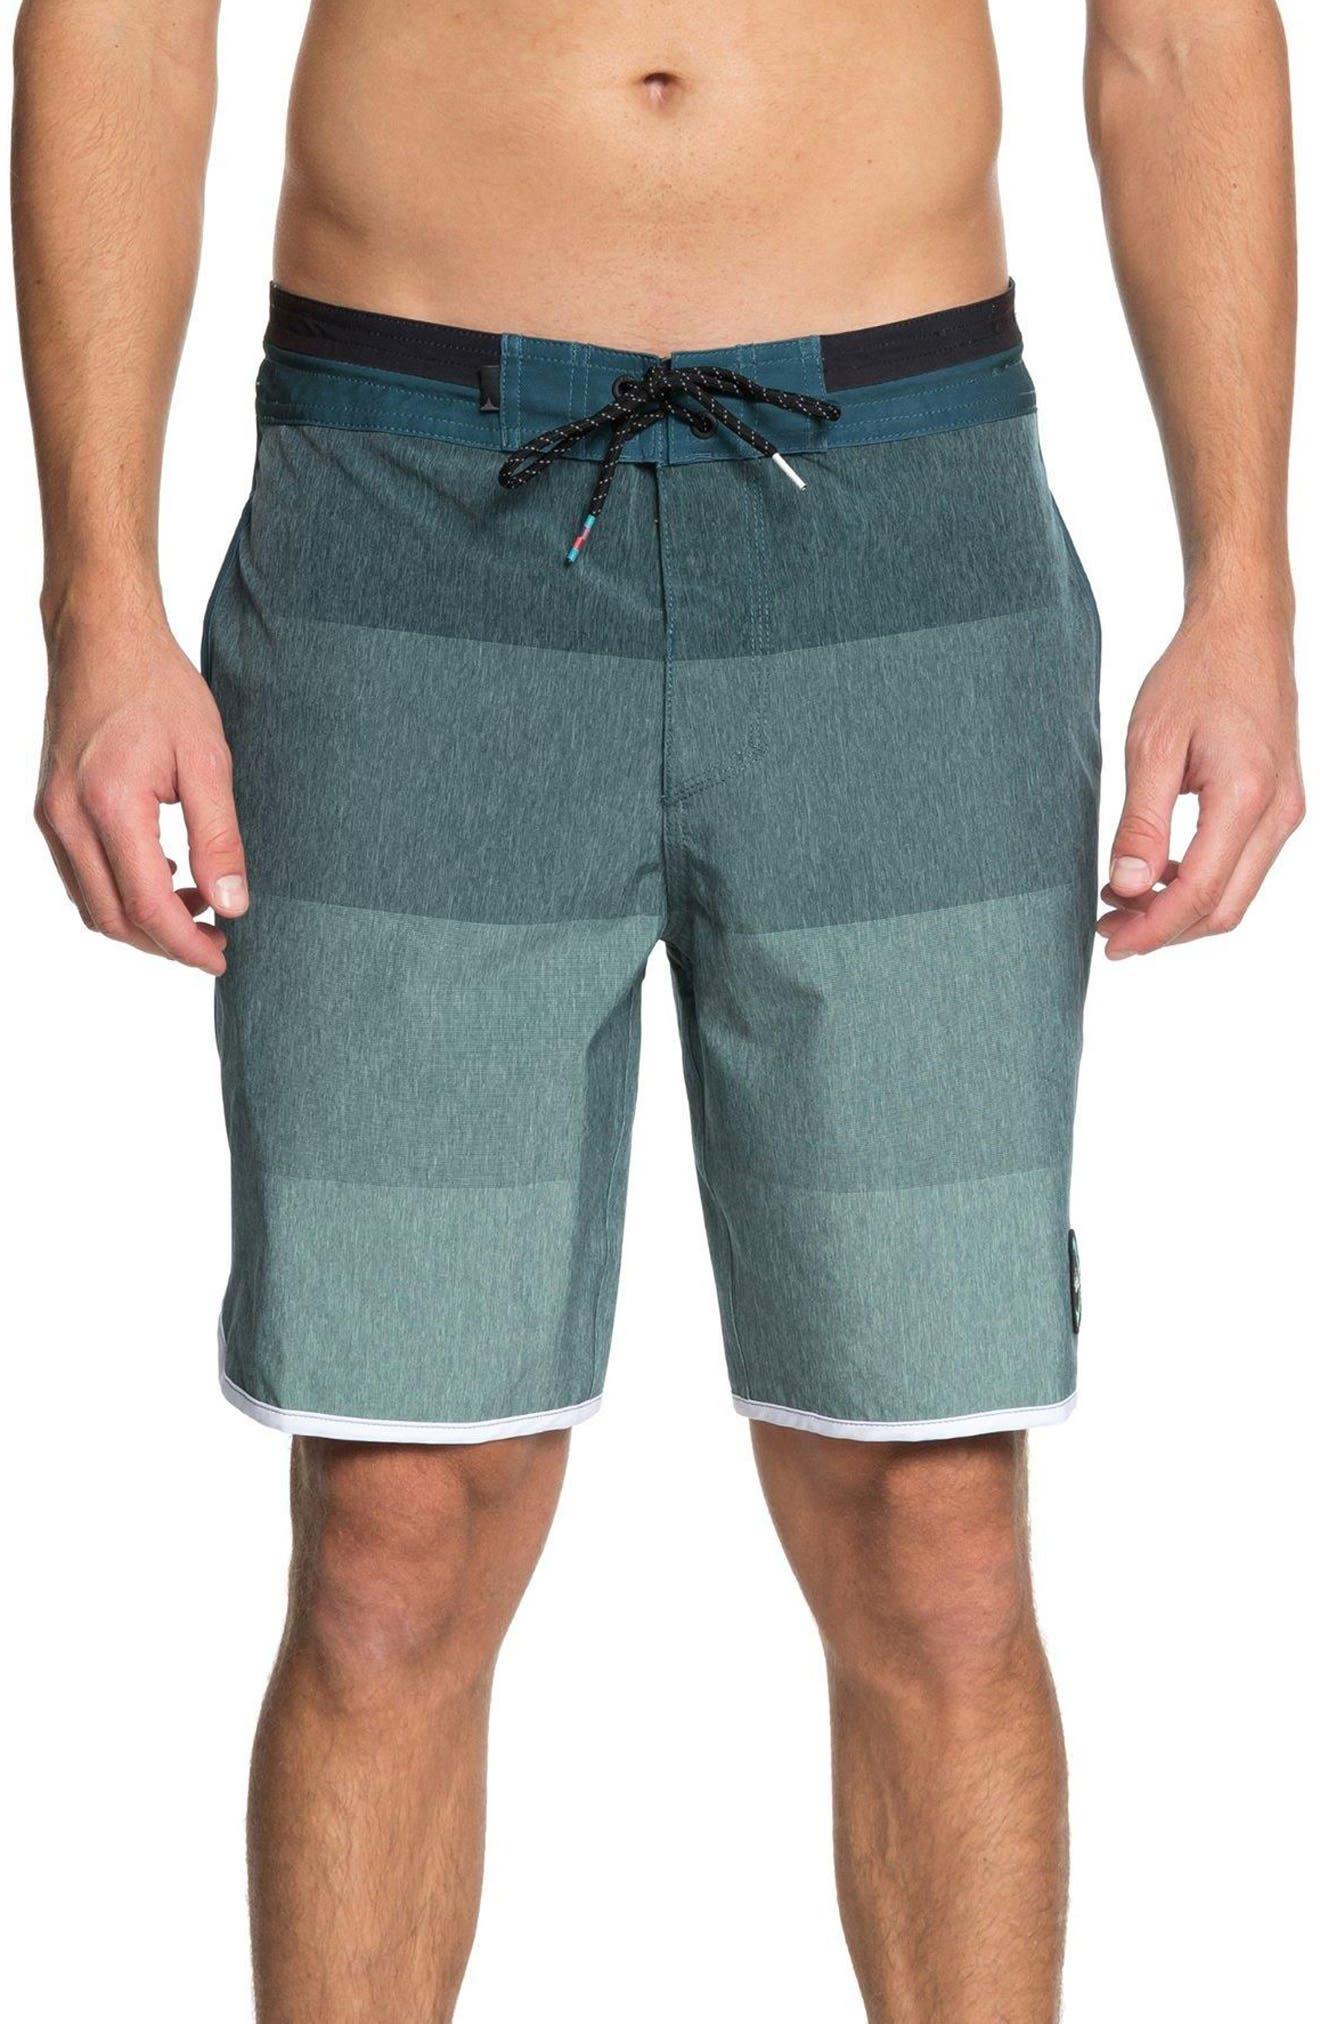 Vista Swim Shorts,                         Main,                         color, Atlantic Deep